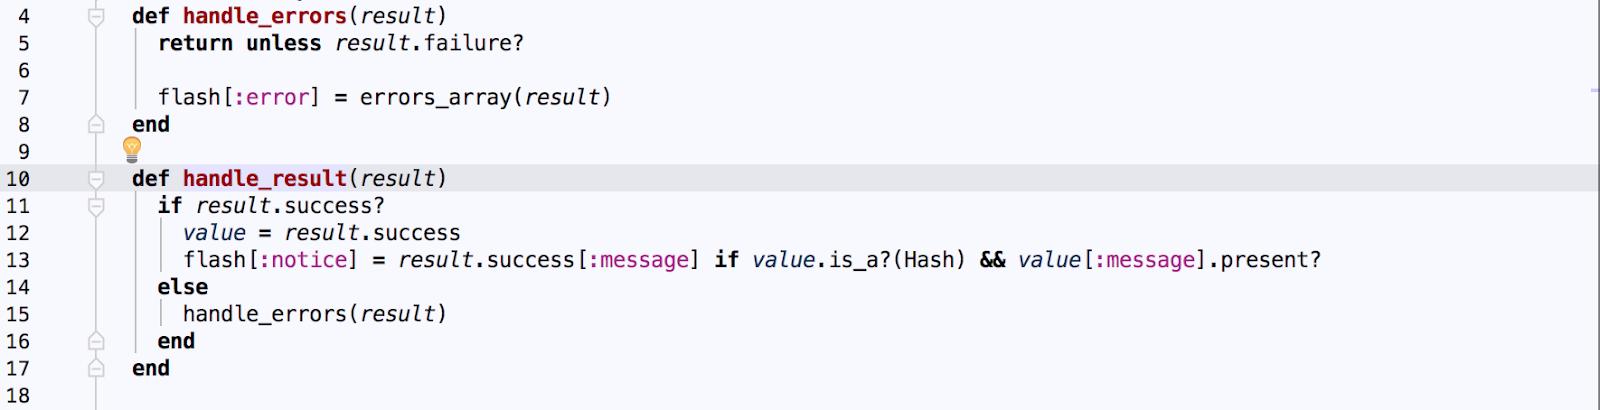 handle errors